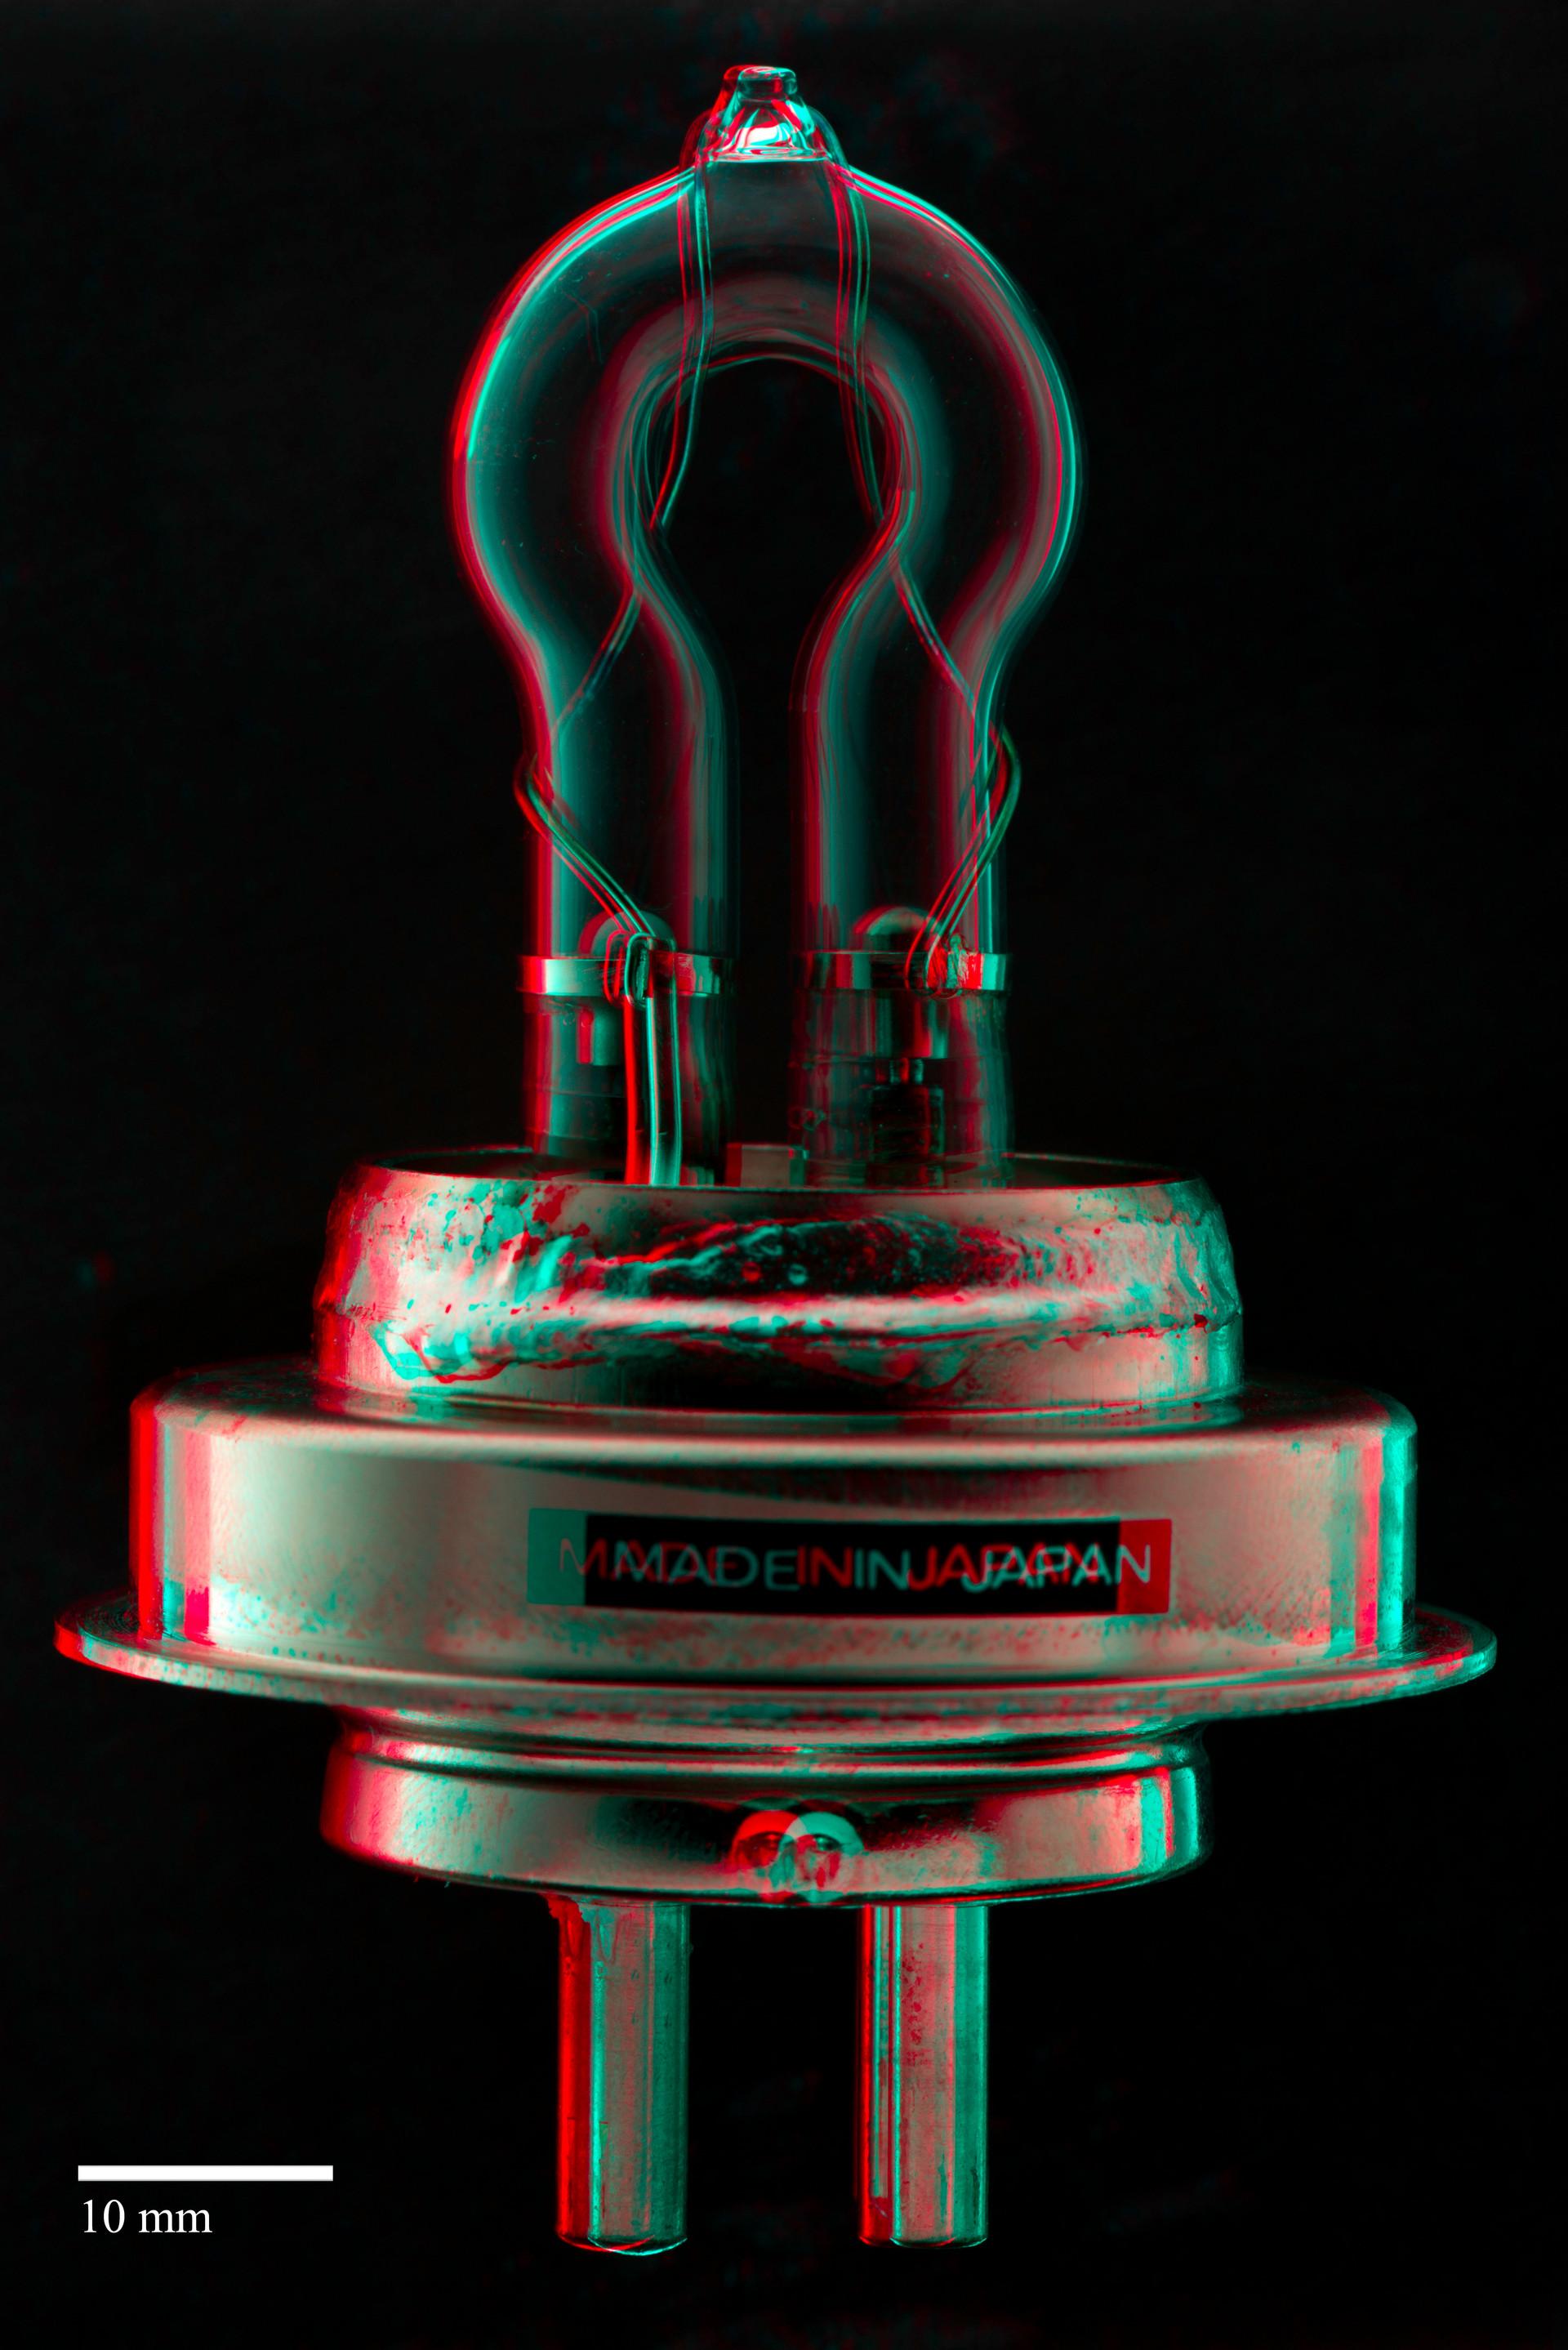 3D image of a light bulb